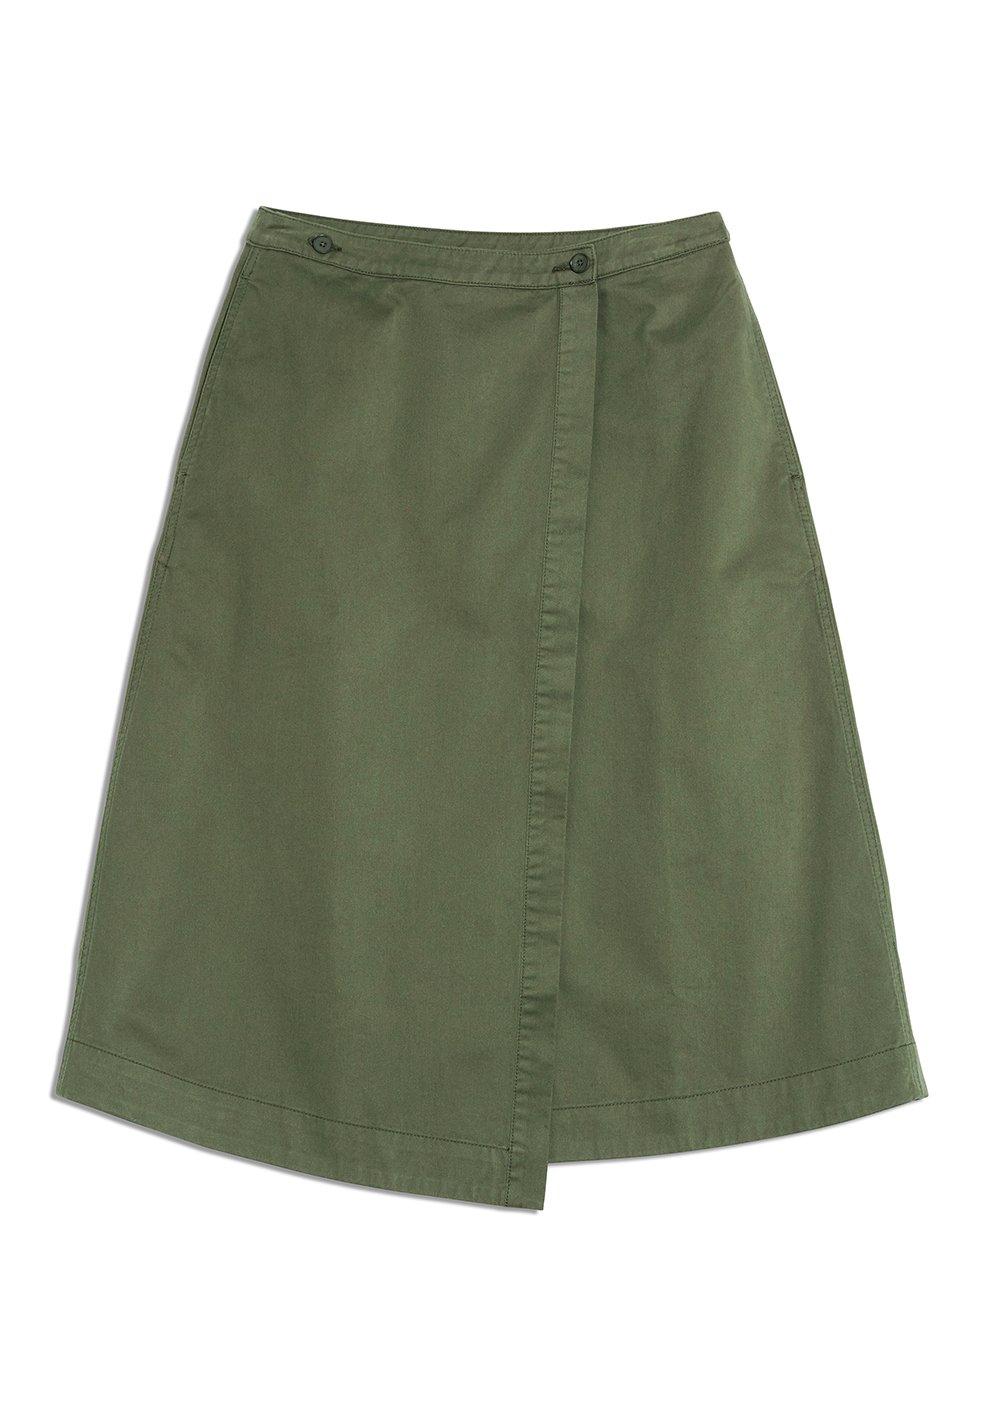 Image of Armedangels  Khaki canvas cotton wrap skirt